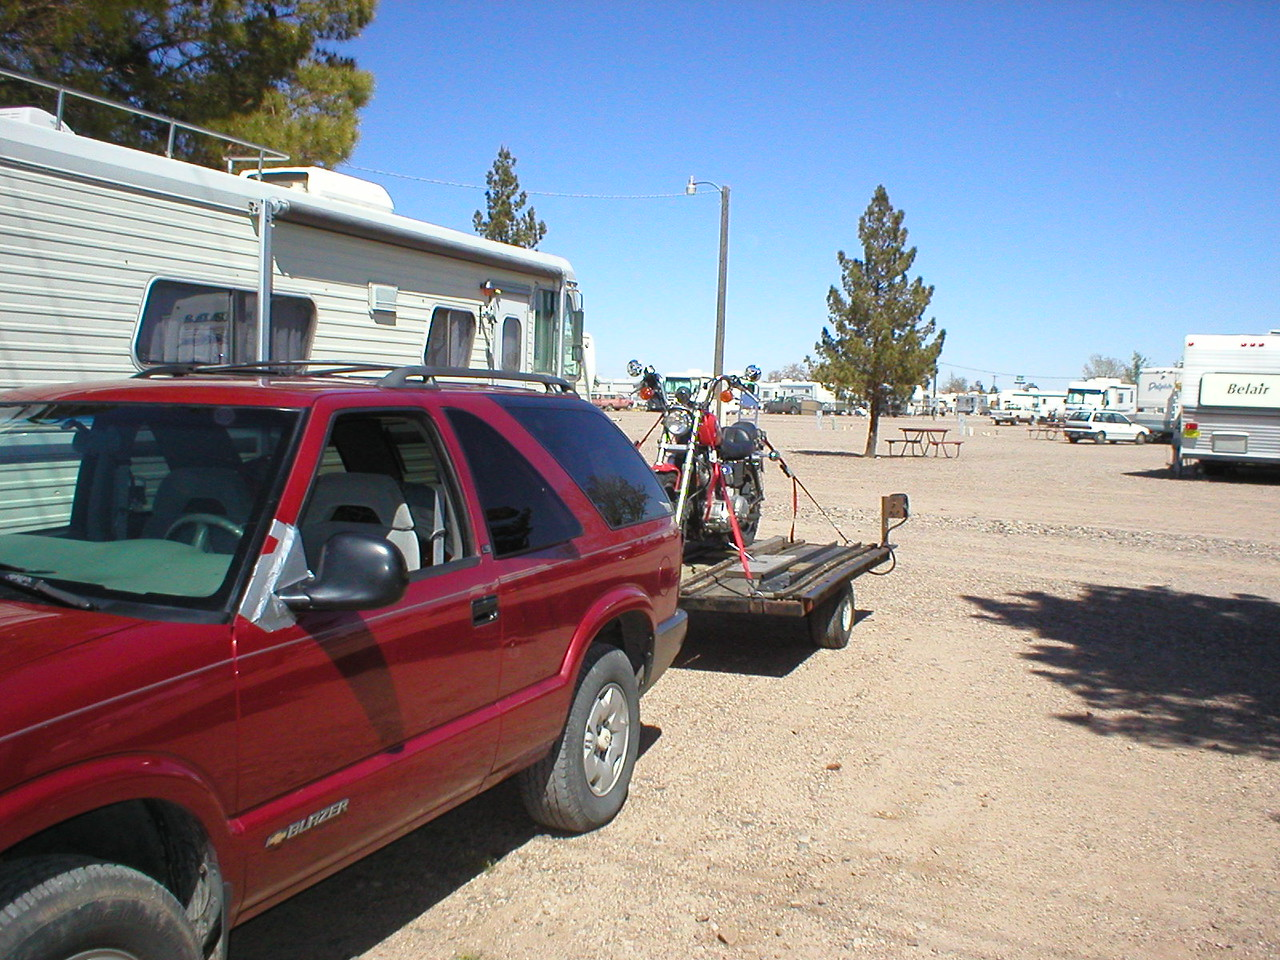 Road Runner RV park, Demming NM. $5.00 / week to store the truck. Sweet!